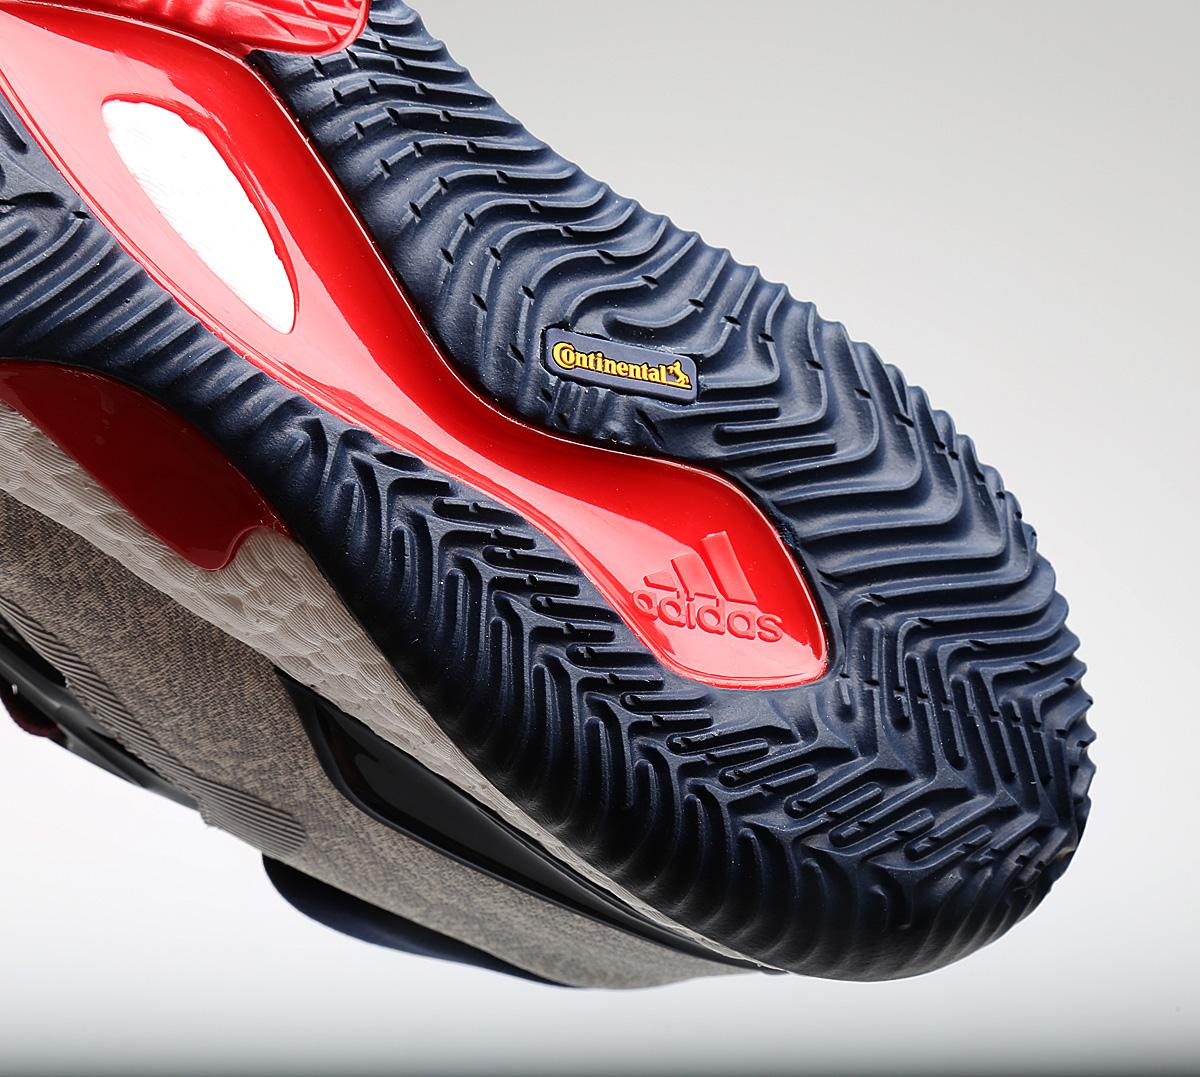 Kyle-Lowry-USA-Olympics-adidas-Crazylight-Boost-2016-5